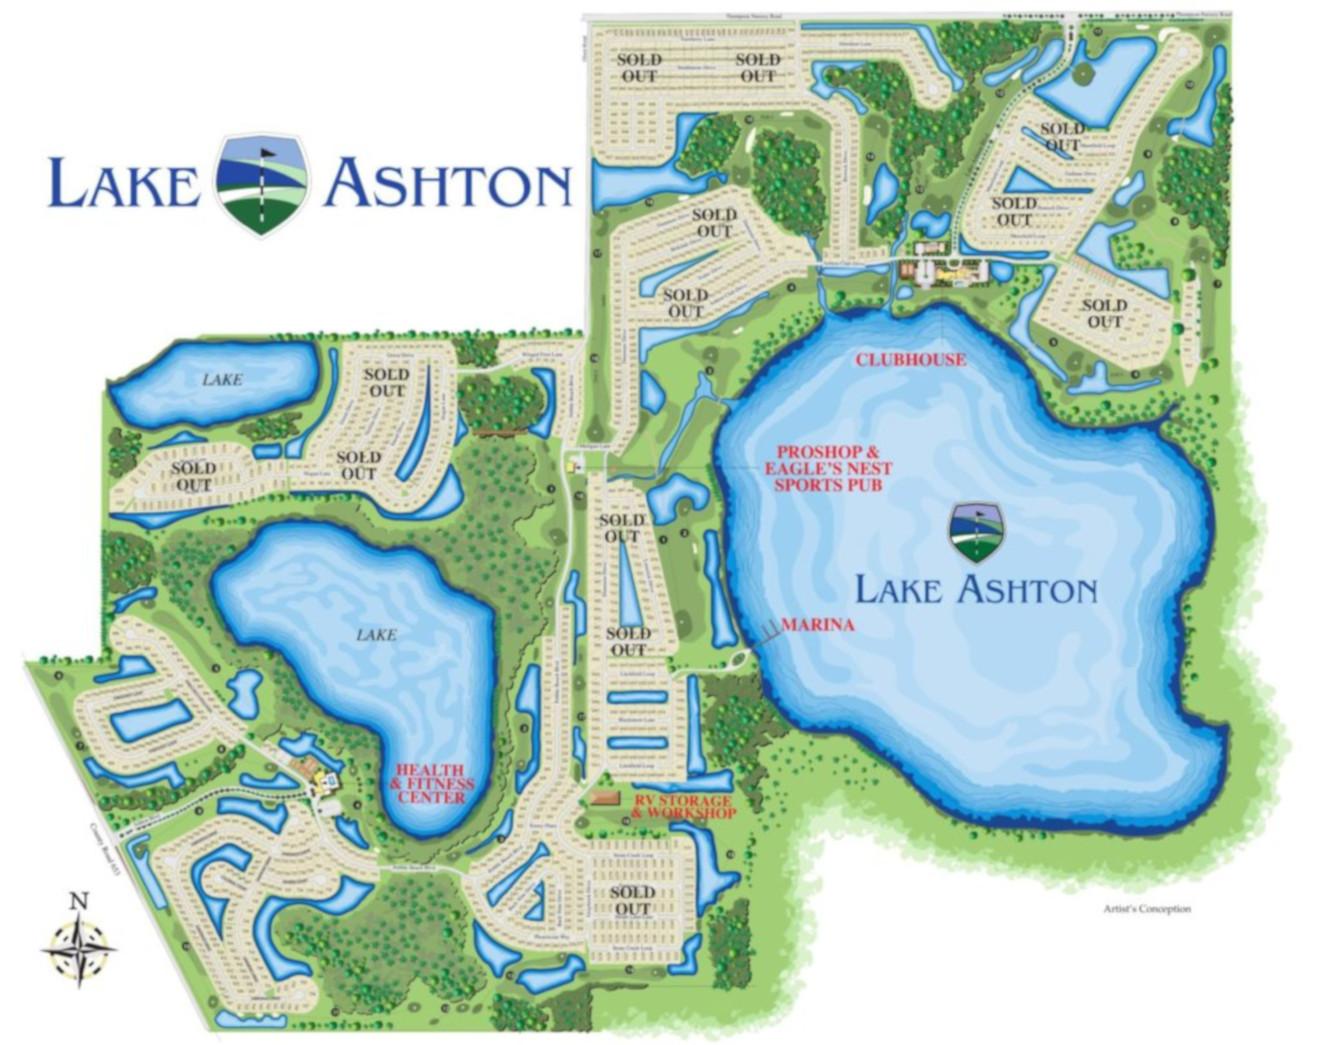 Florida Retirement Community Master Site Plan